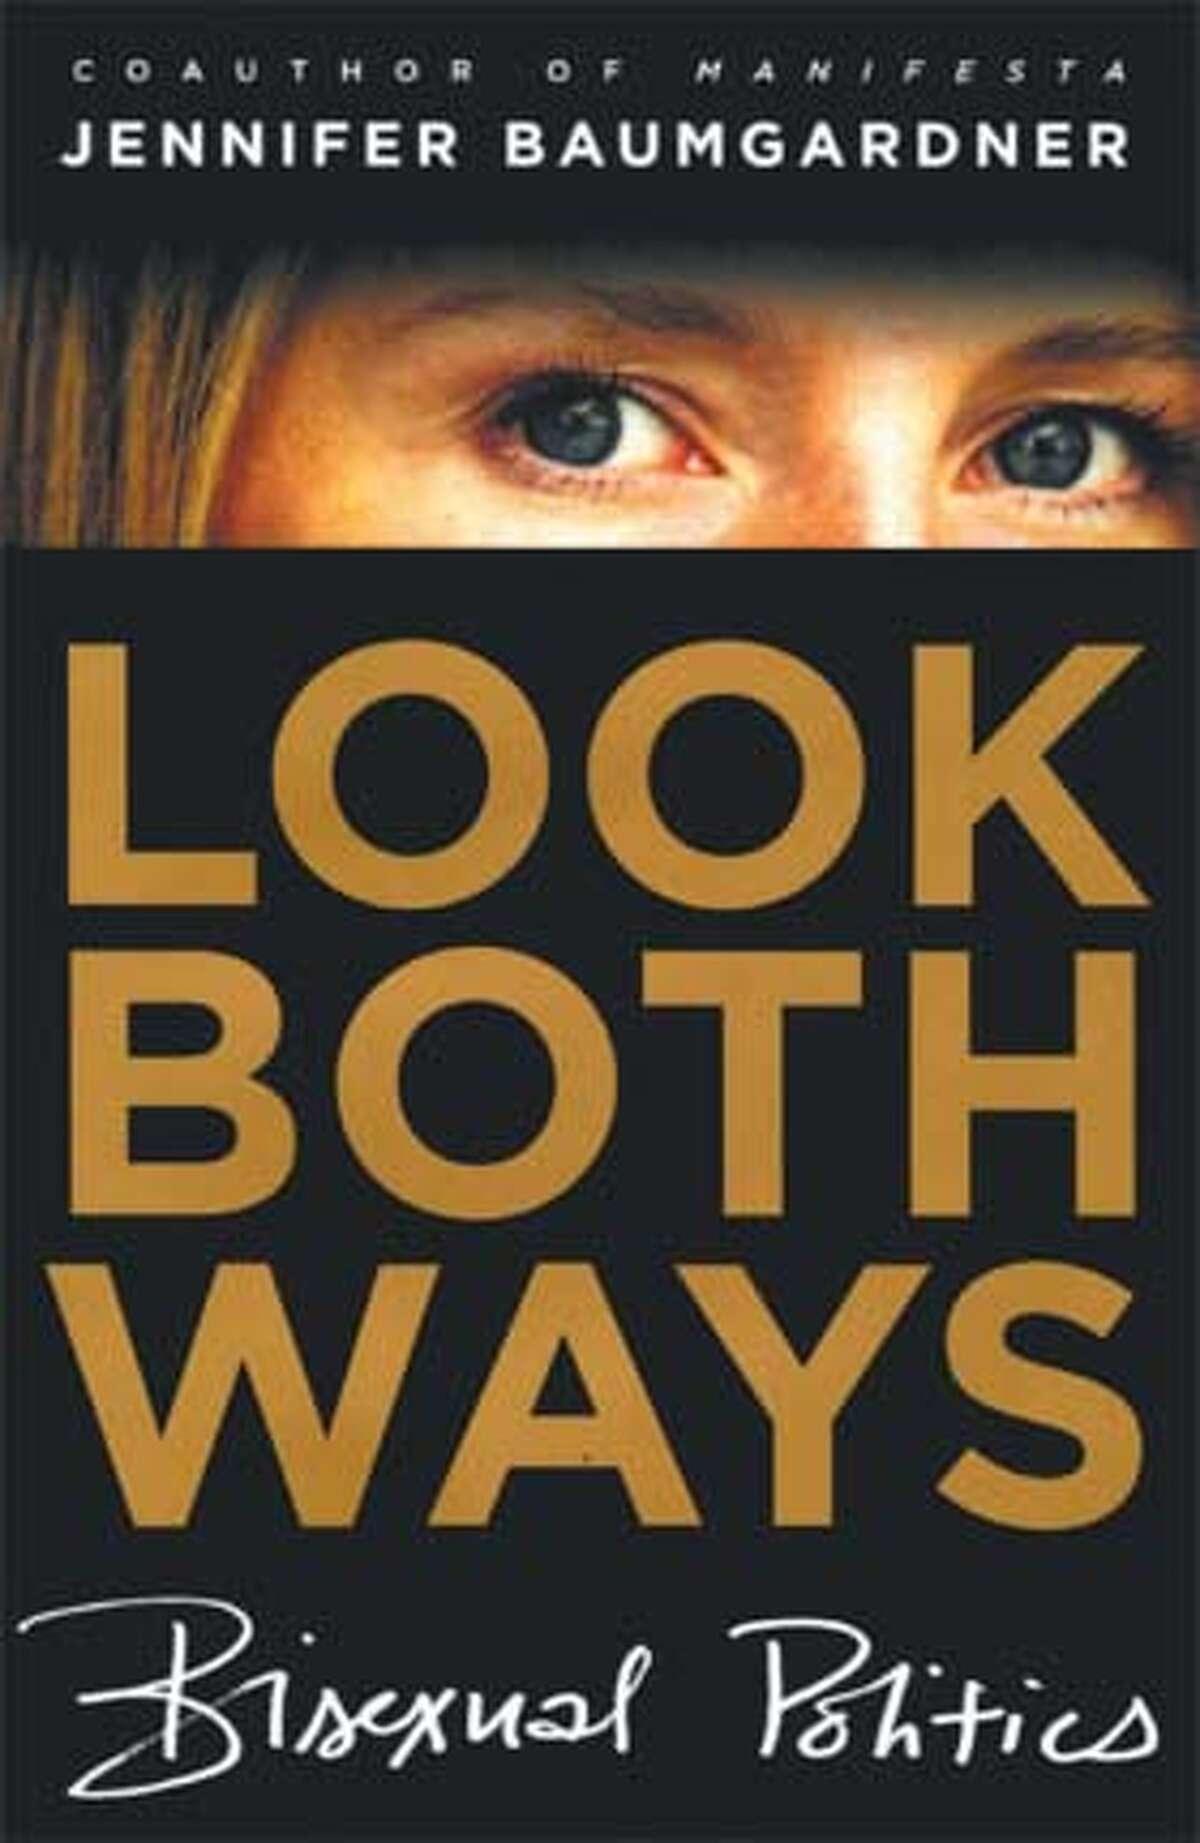 """Look Both Ways: Bisexual Politics"" by Jennifer Baumgardner"